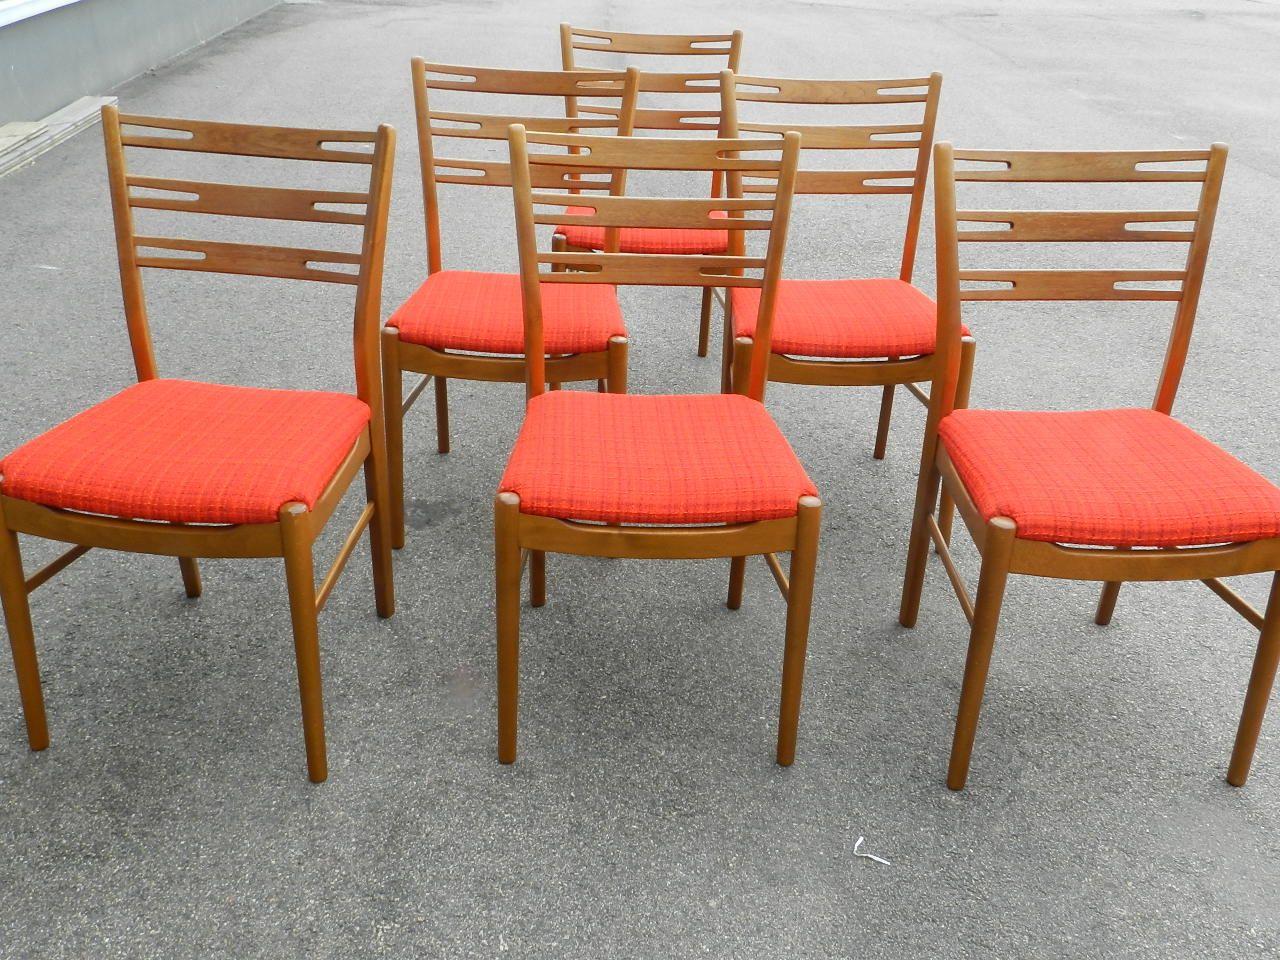 6 st retro stolar i mörk teak med ceriseröd originalklädsel